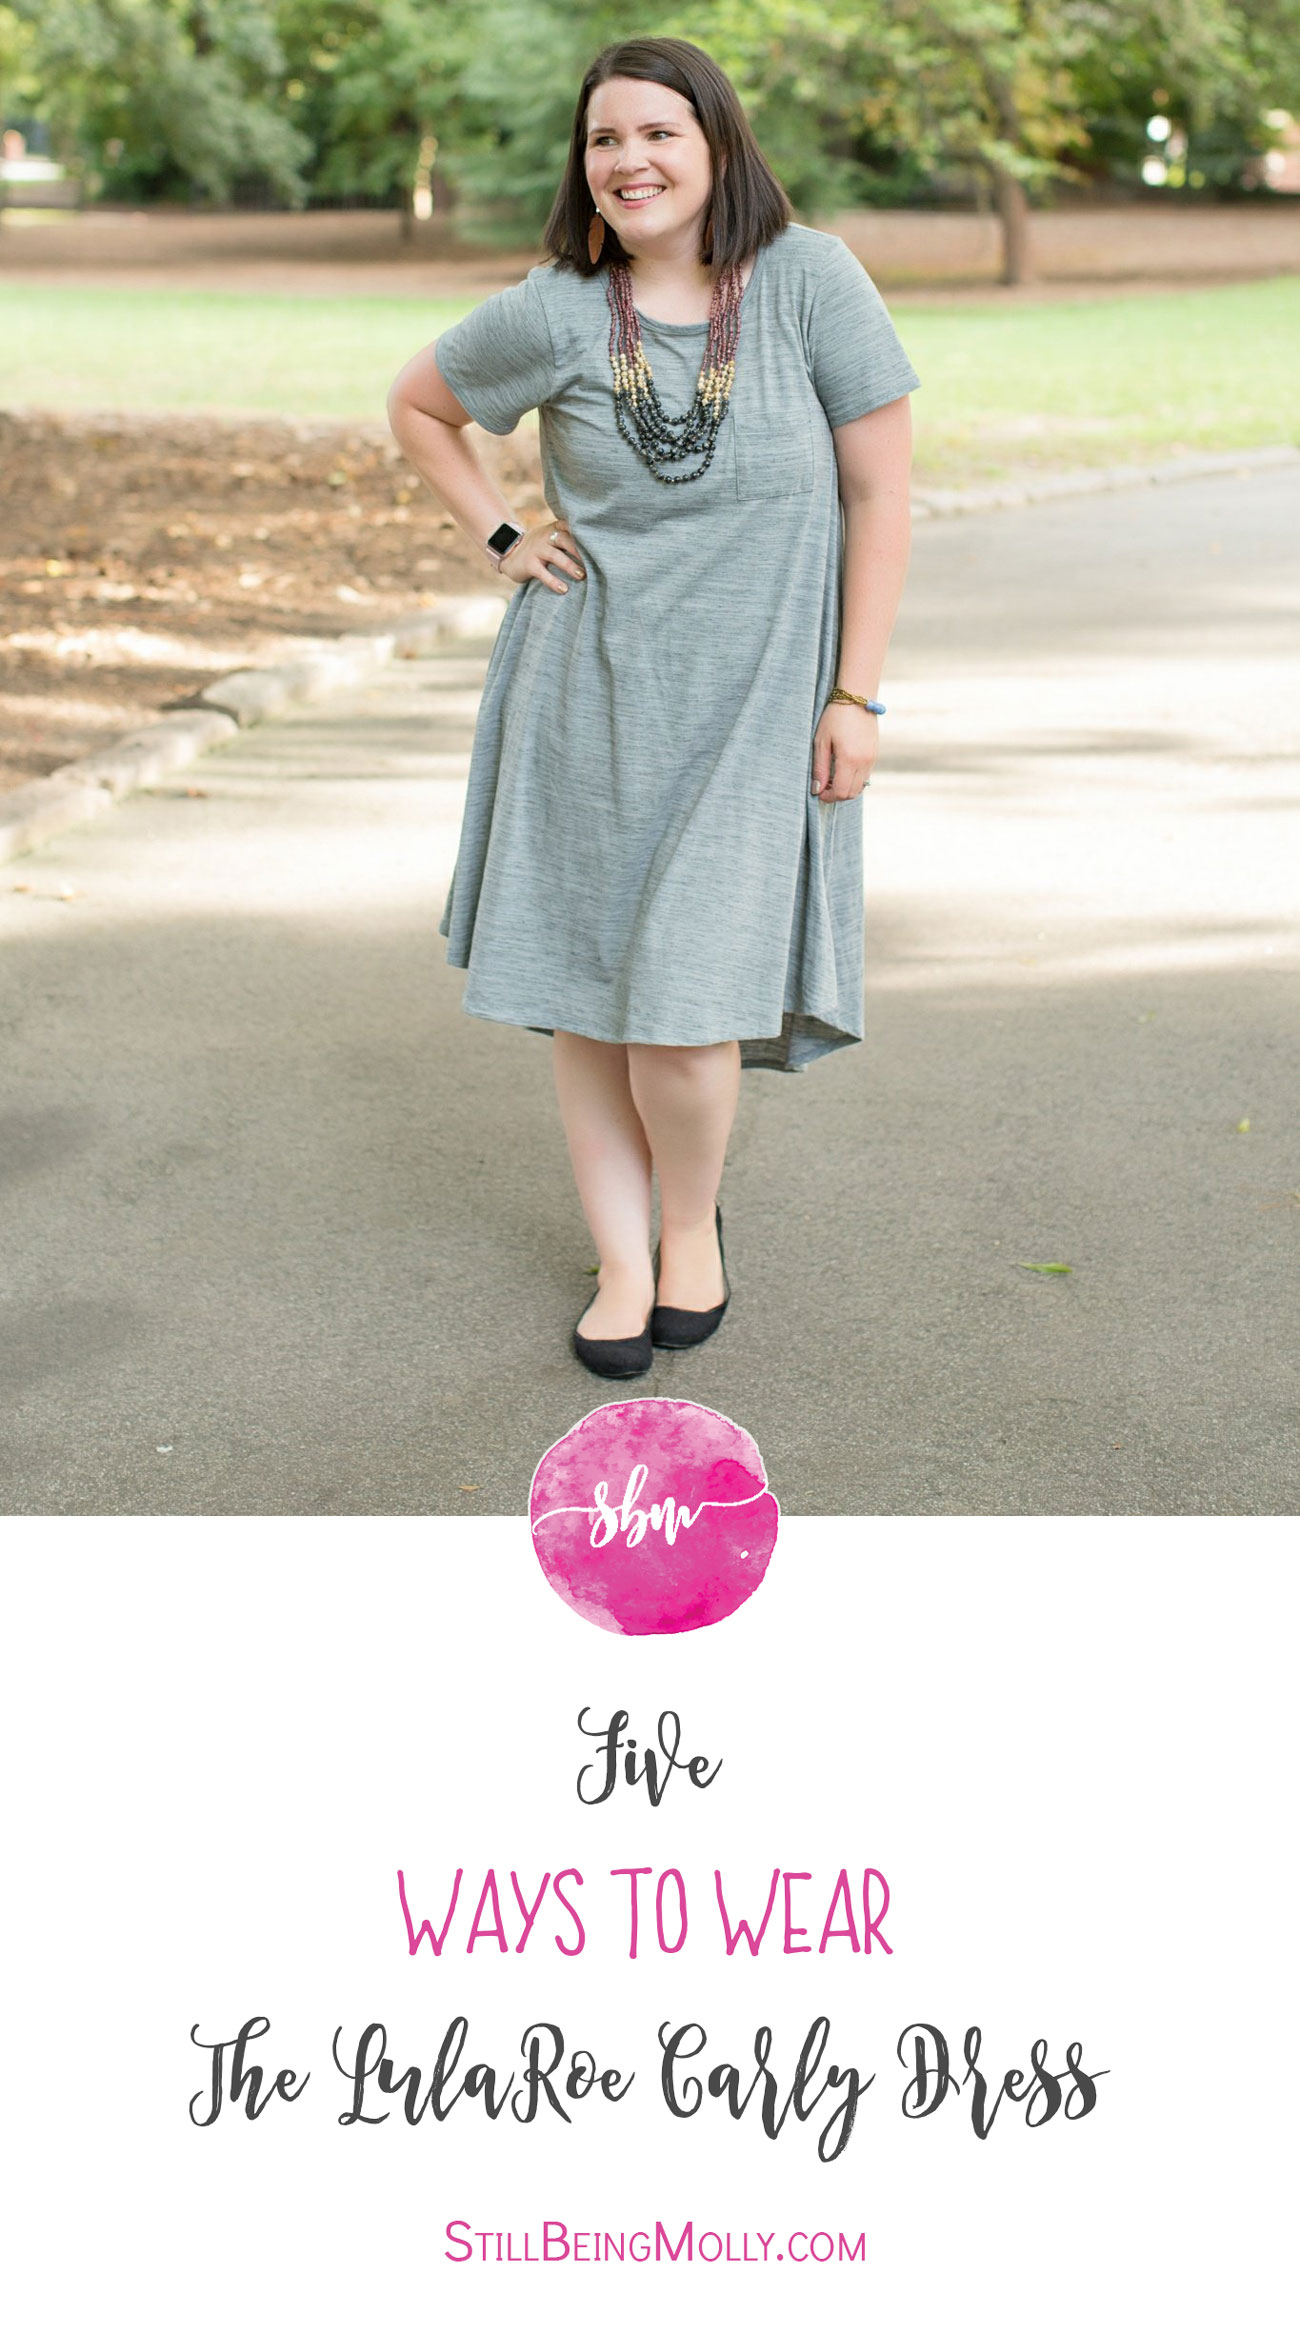 Five Ways to Wear the LulaRoe Carly Dress   How to Style the LulaRoe Carly Dress